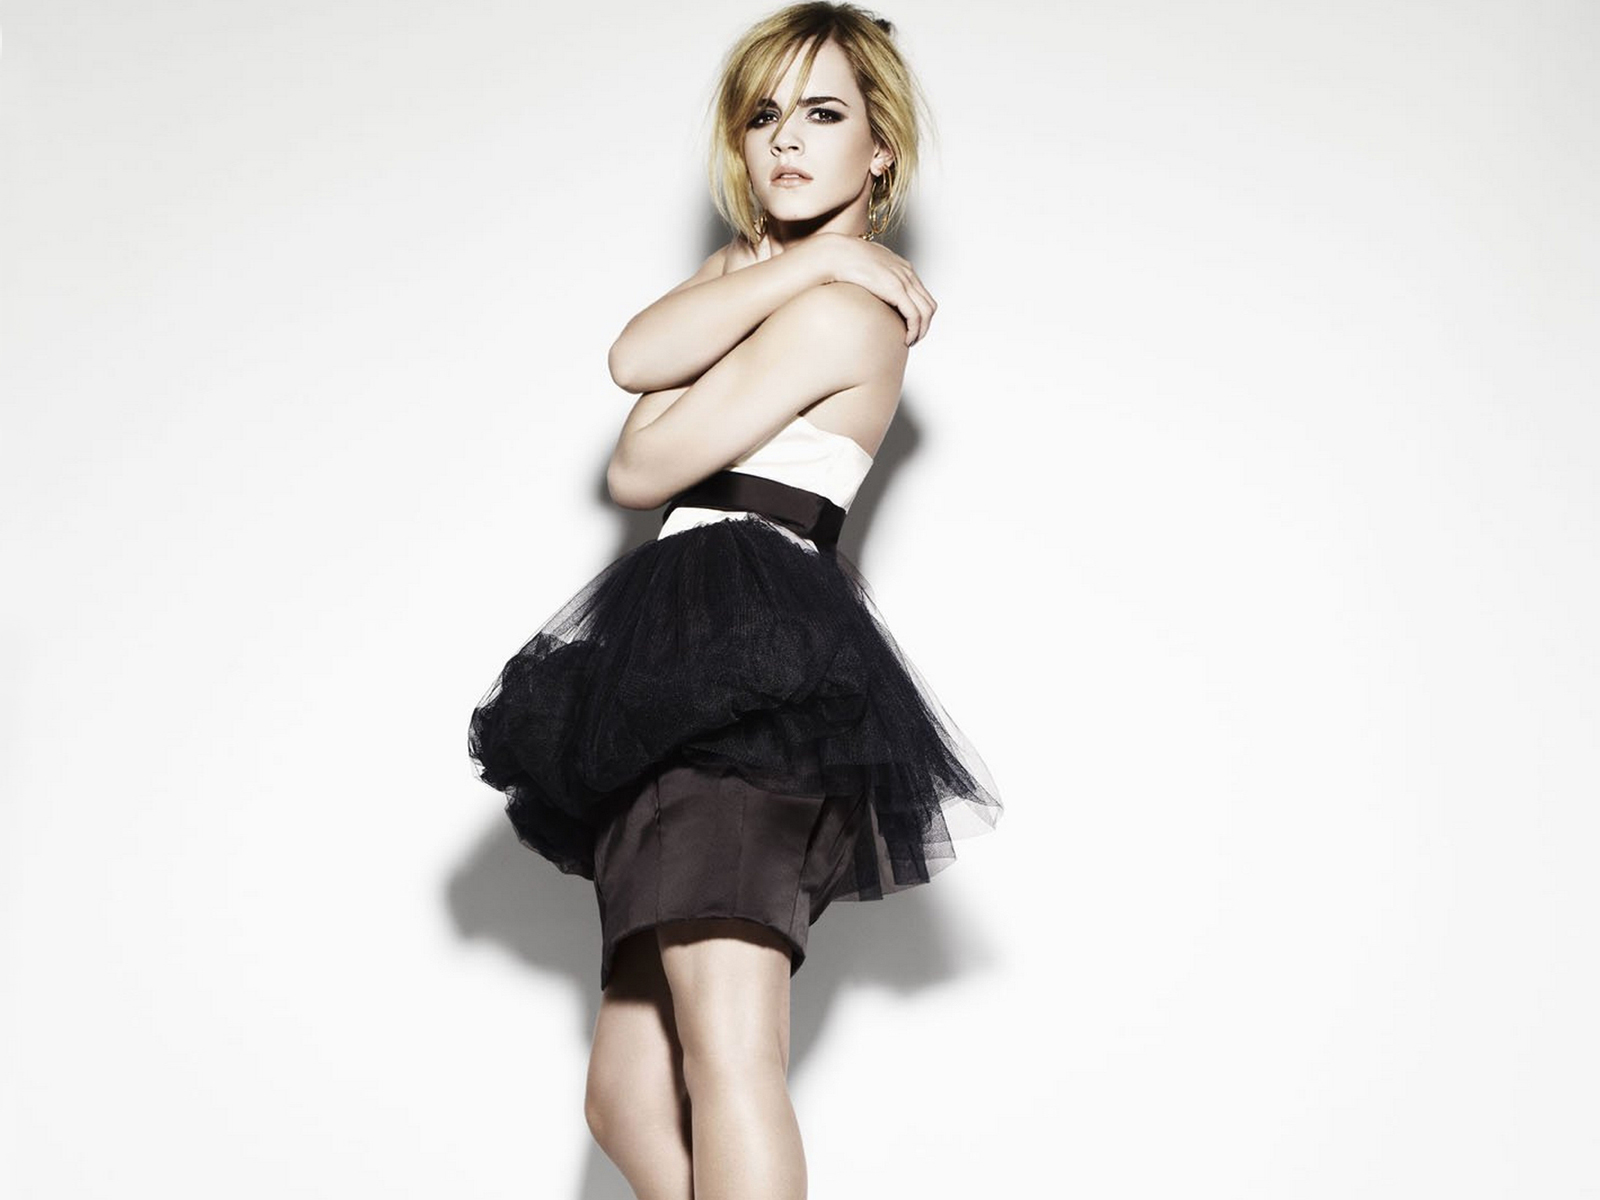 Emma Watson 260 wallpaper